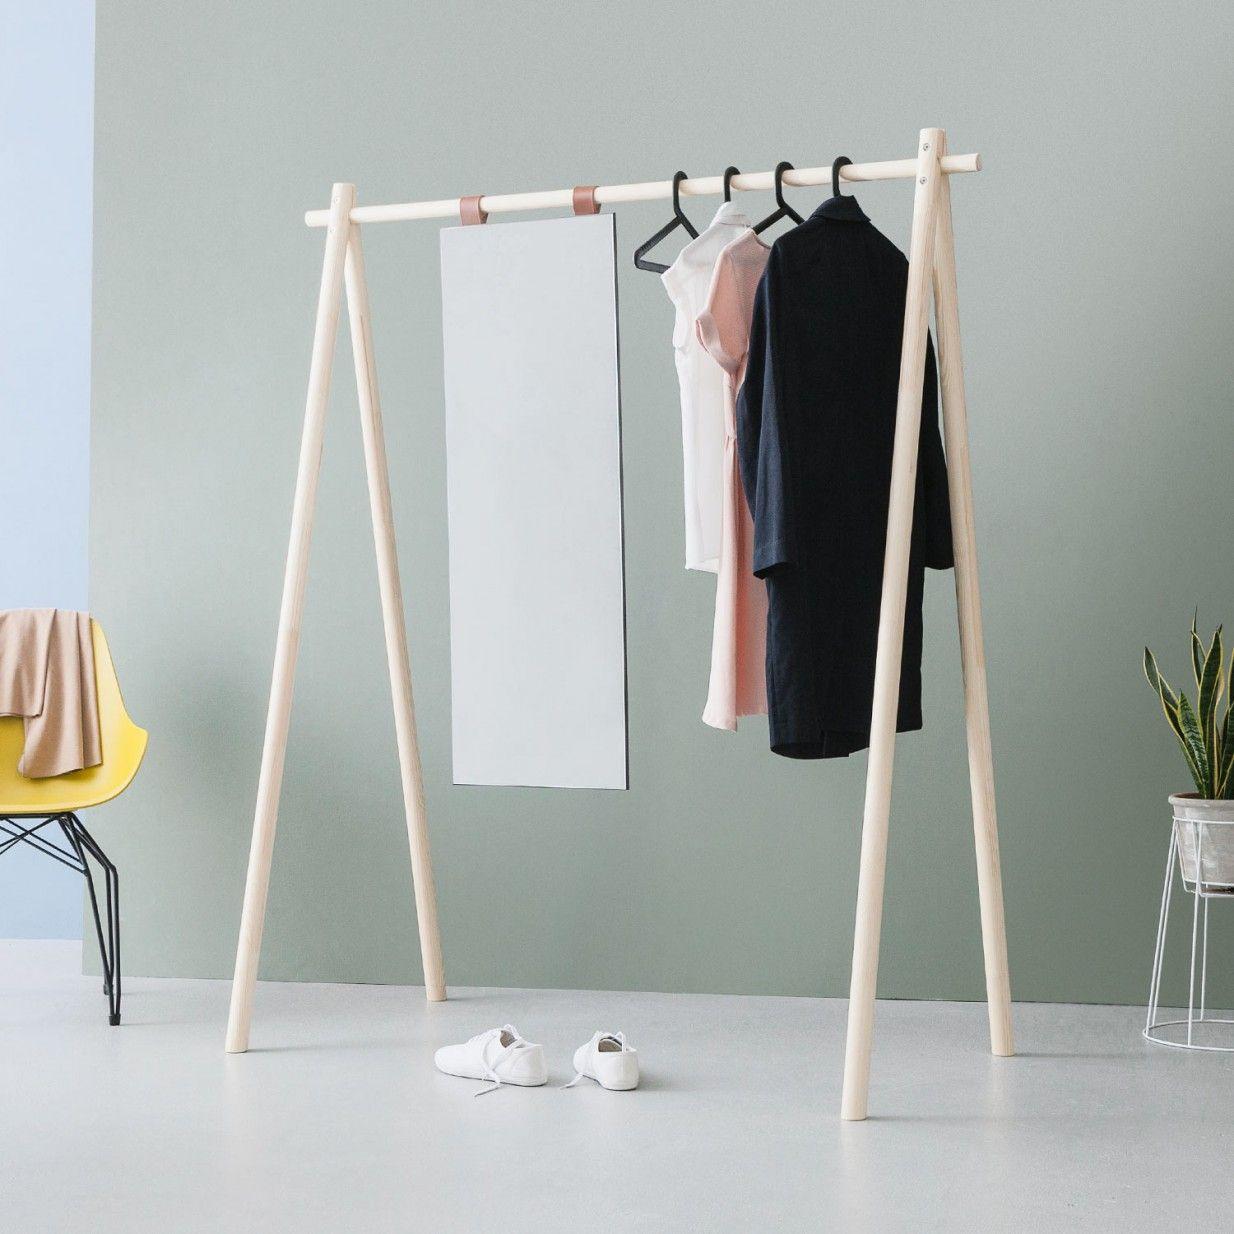 hongi kleiderst nder natur karup diy wohnen. Black Bedroom Furniture Sets. Home Design Ideas